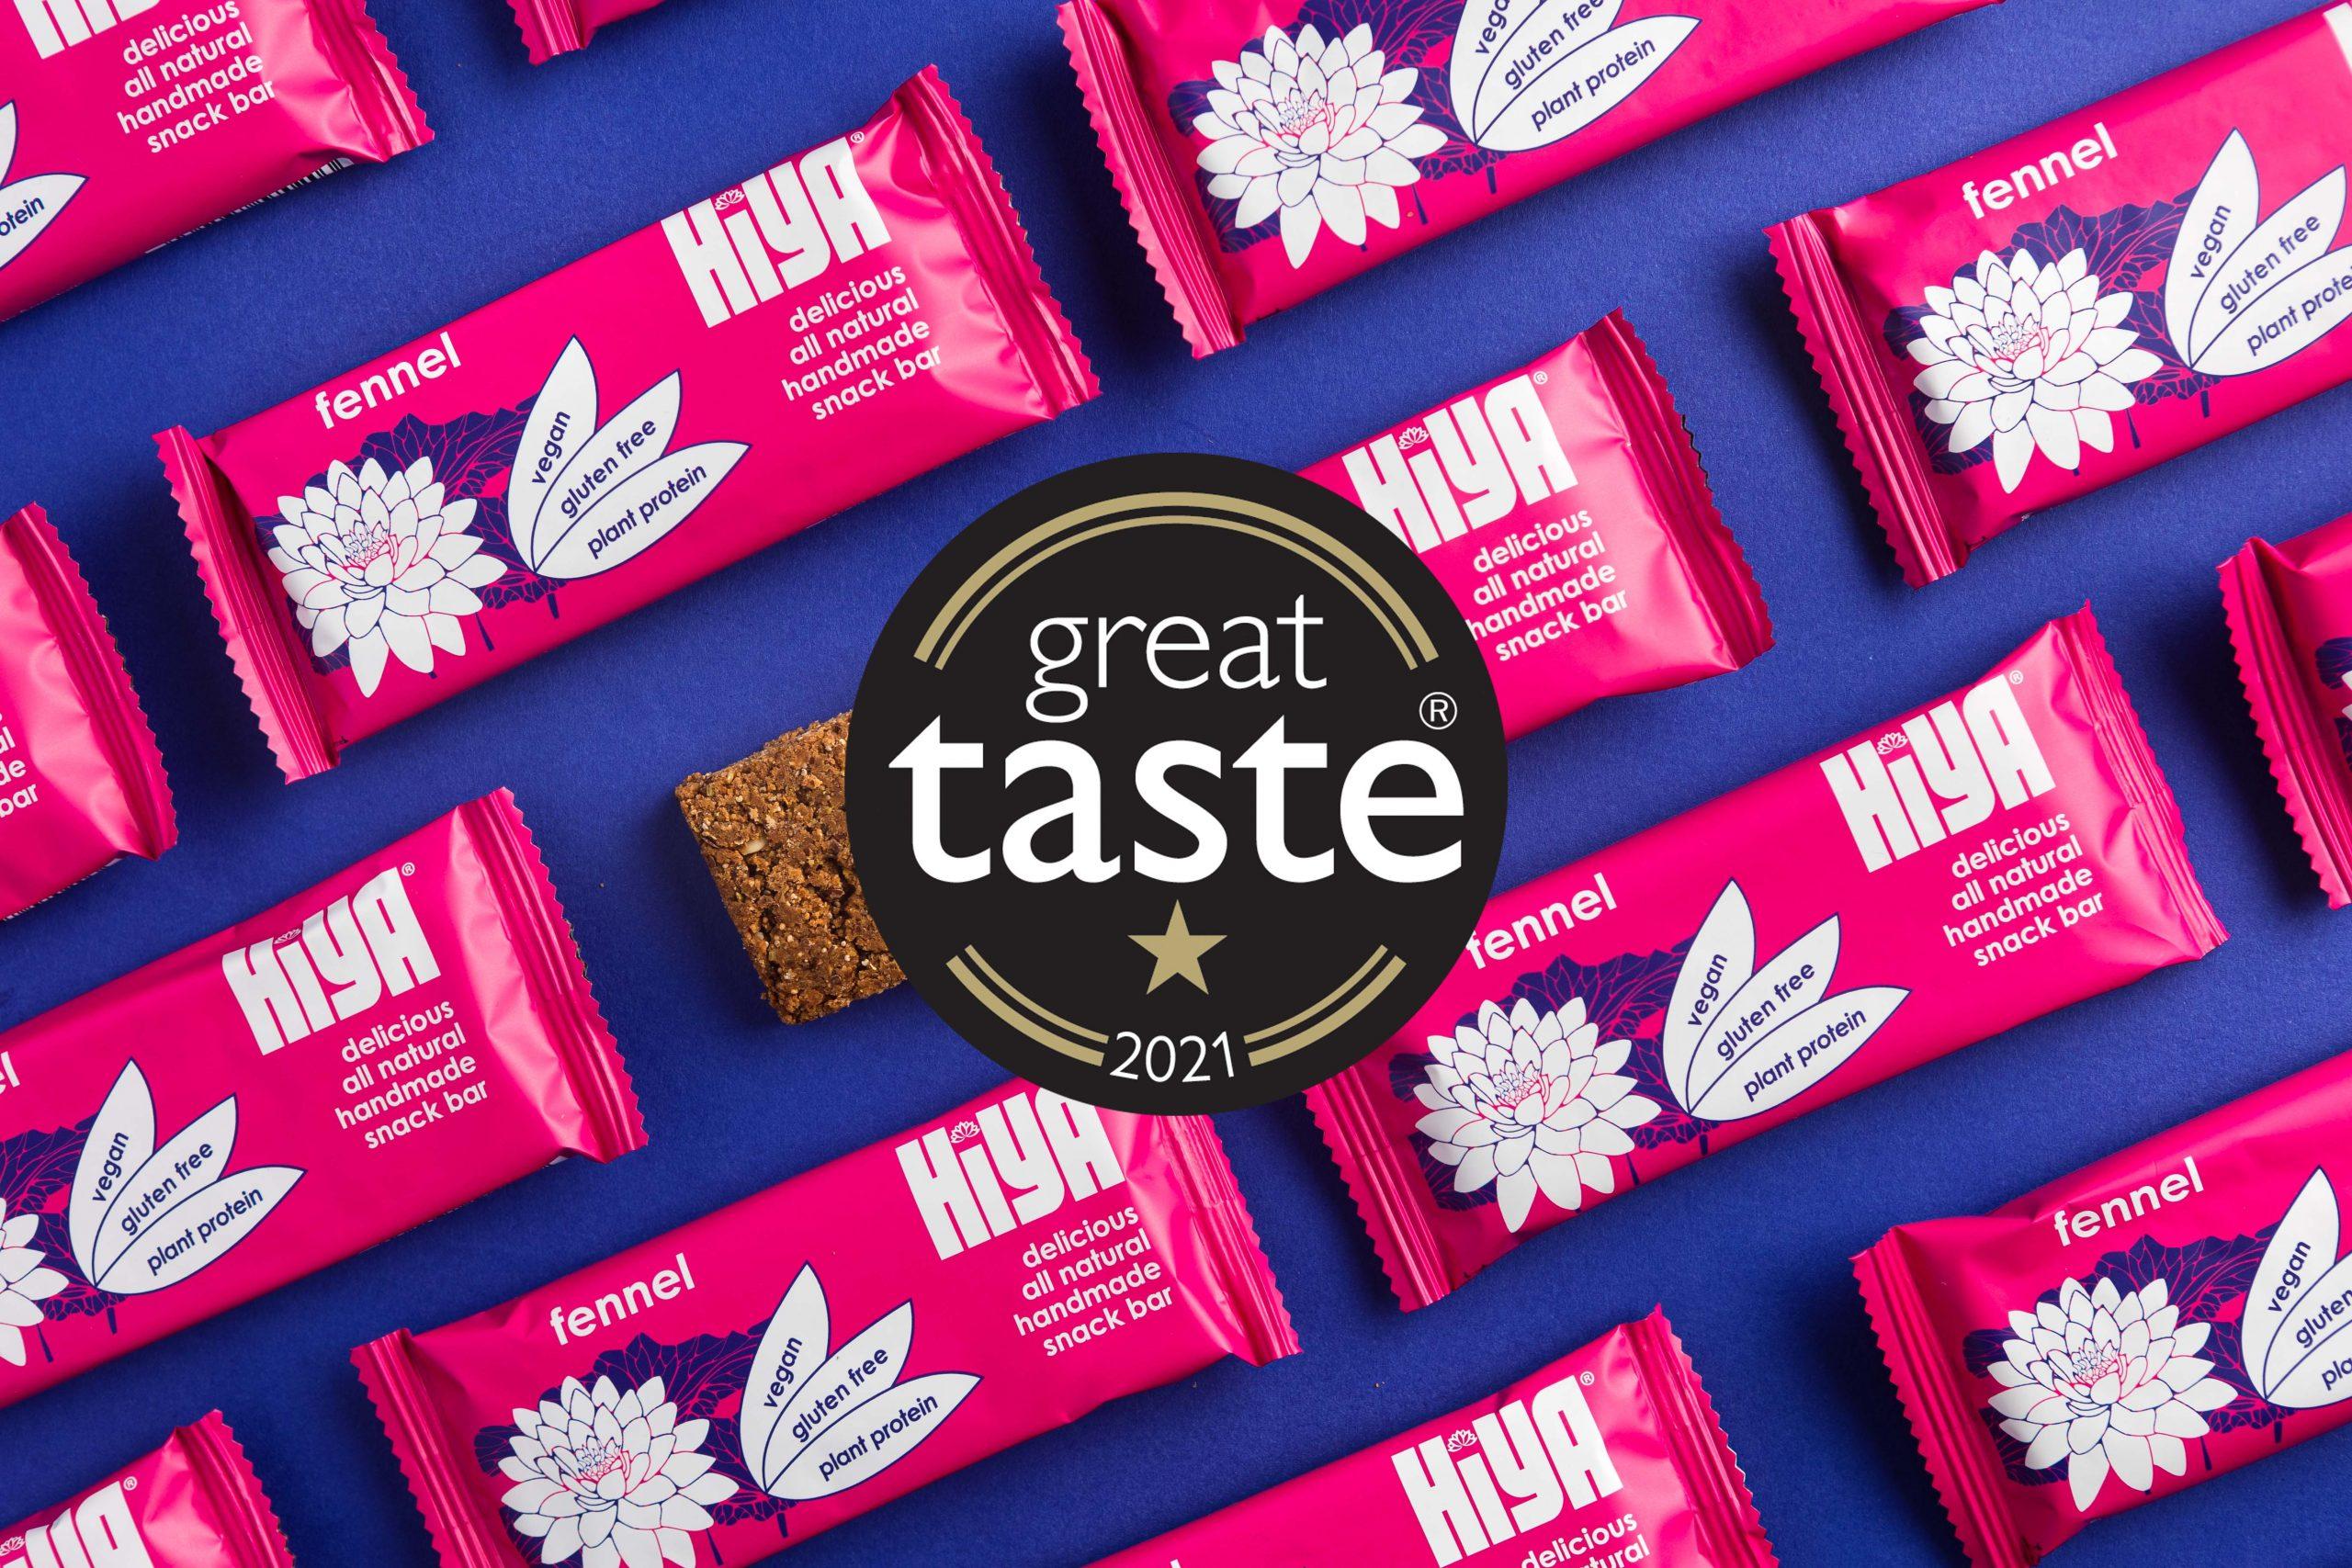 Great Taste award winner - Hiya fennel bars